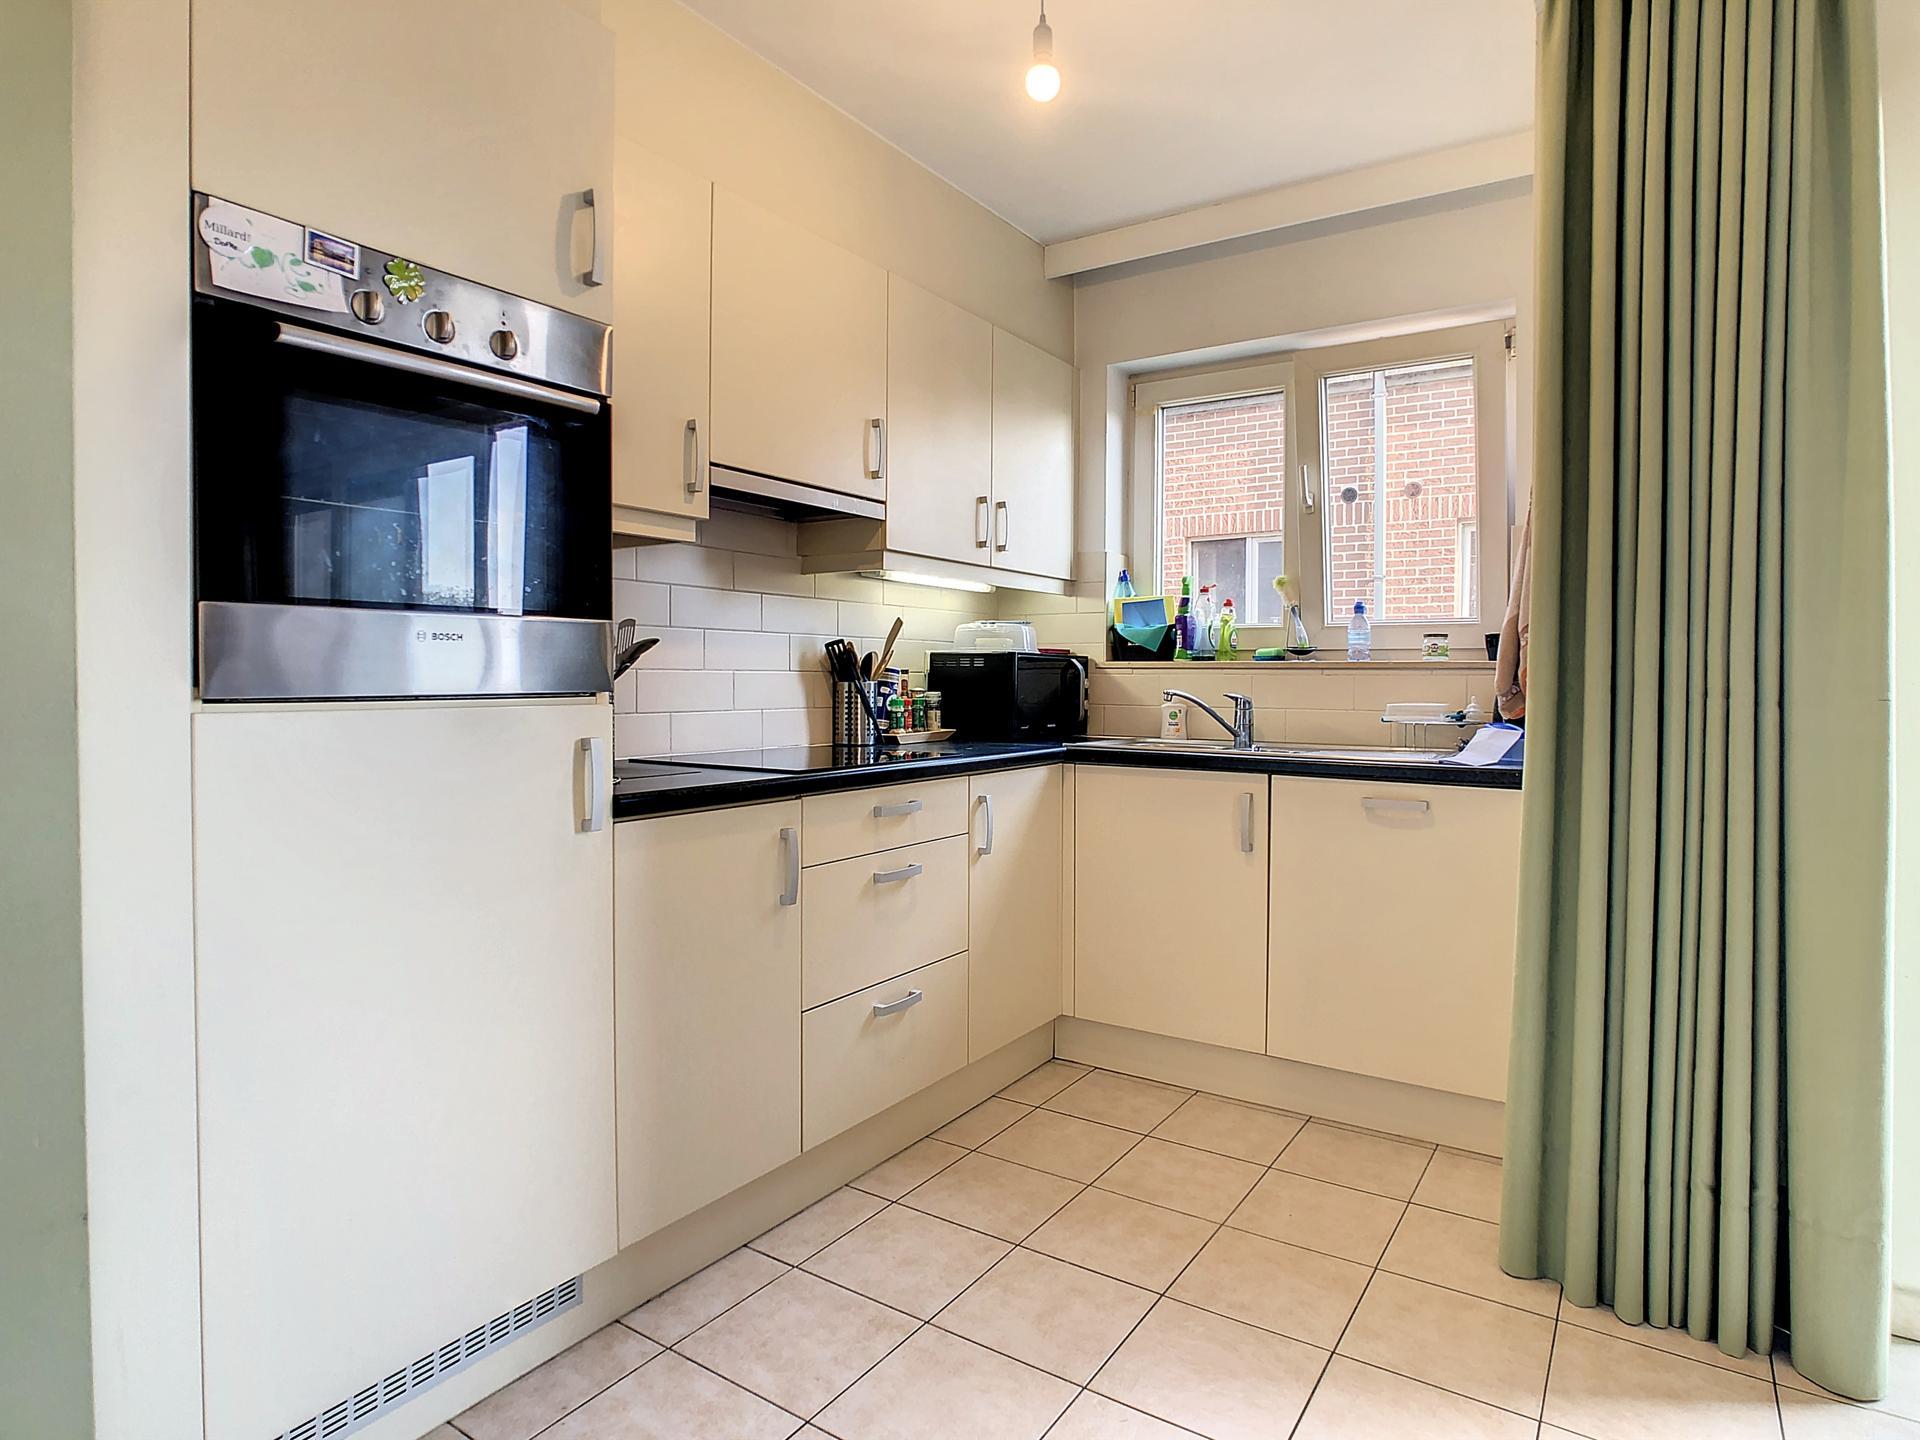 Appartement - Jette - #4512577-1